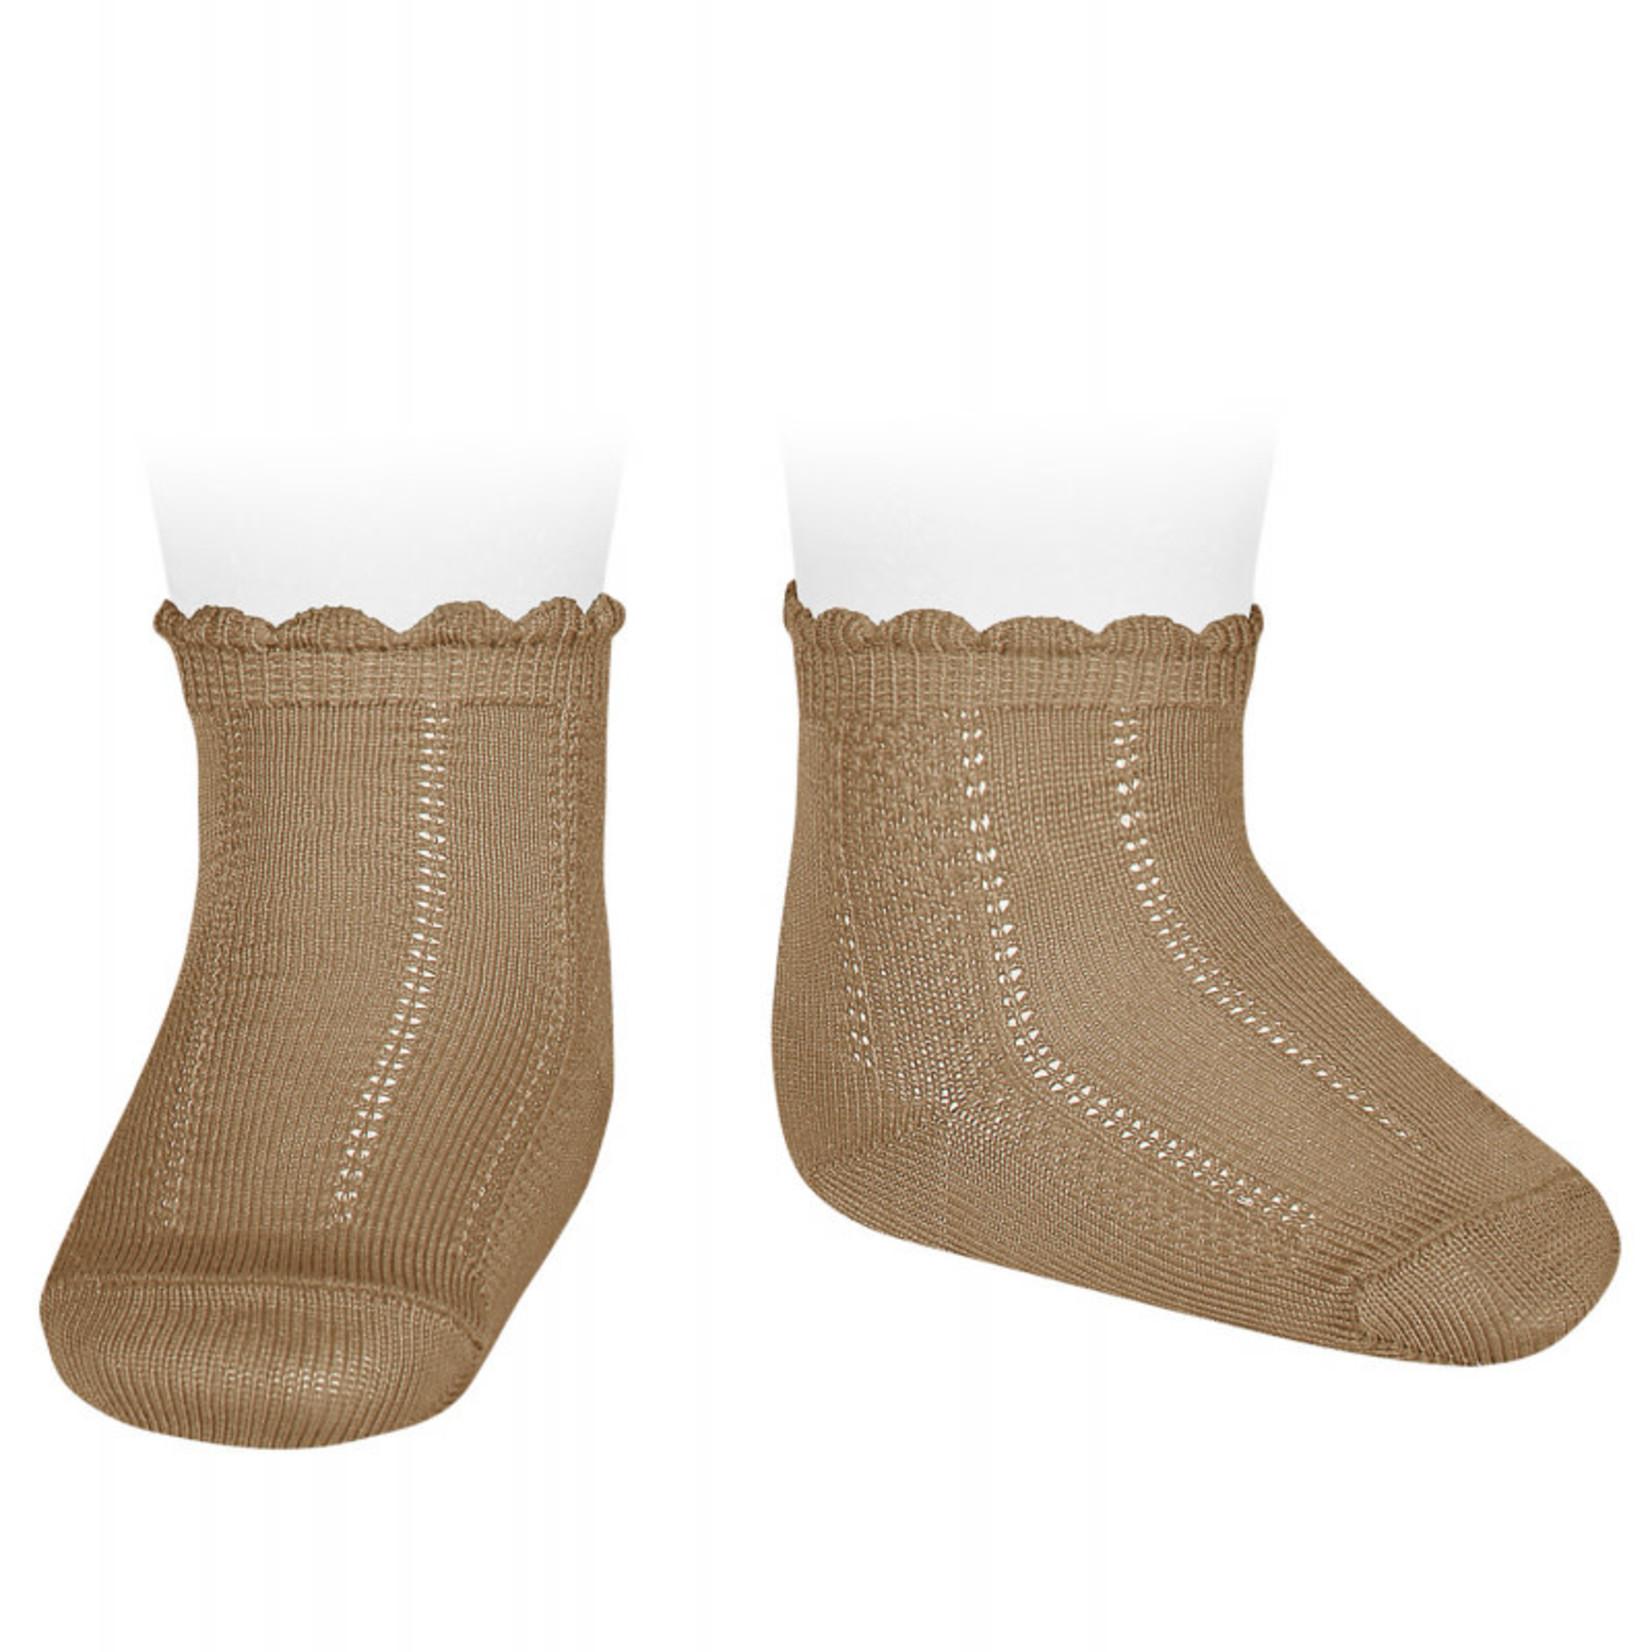 Condor Newborn  Socks - Camel